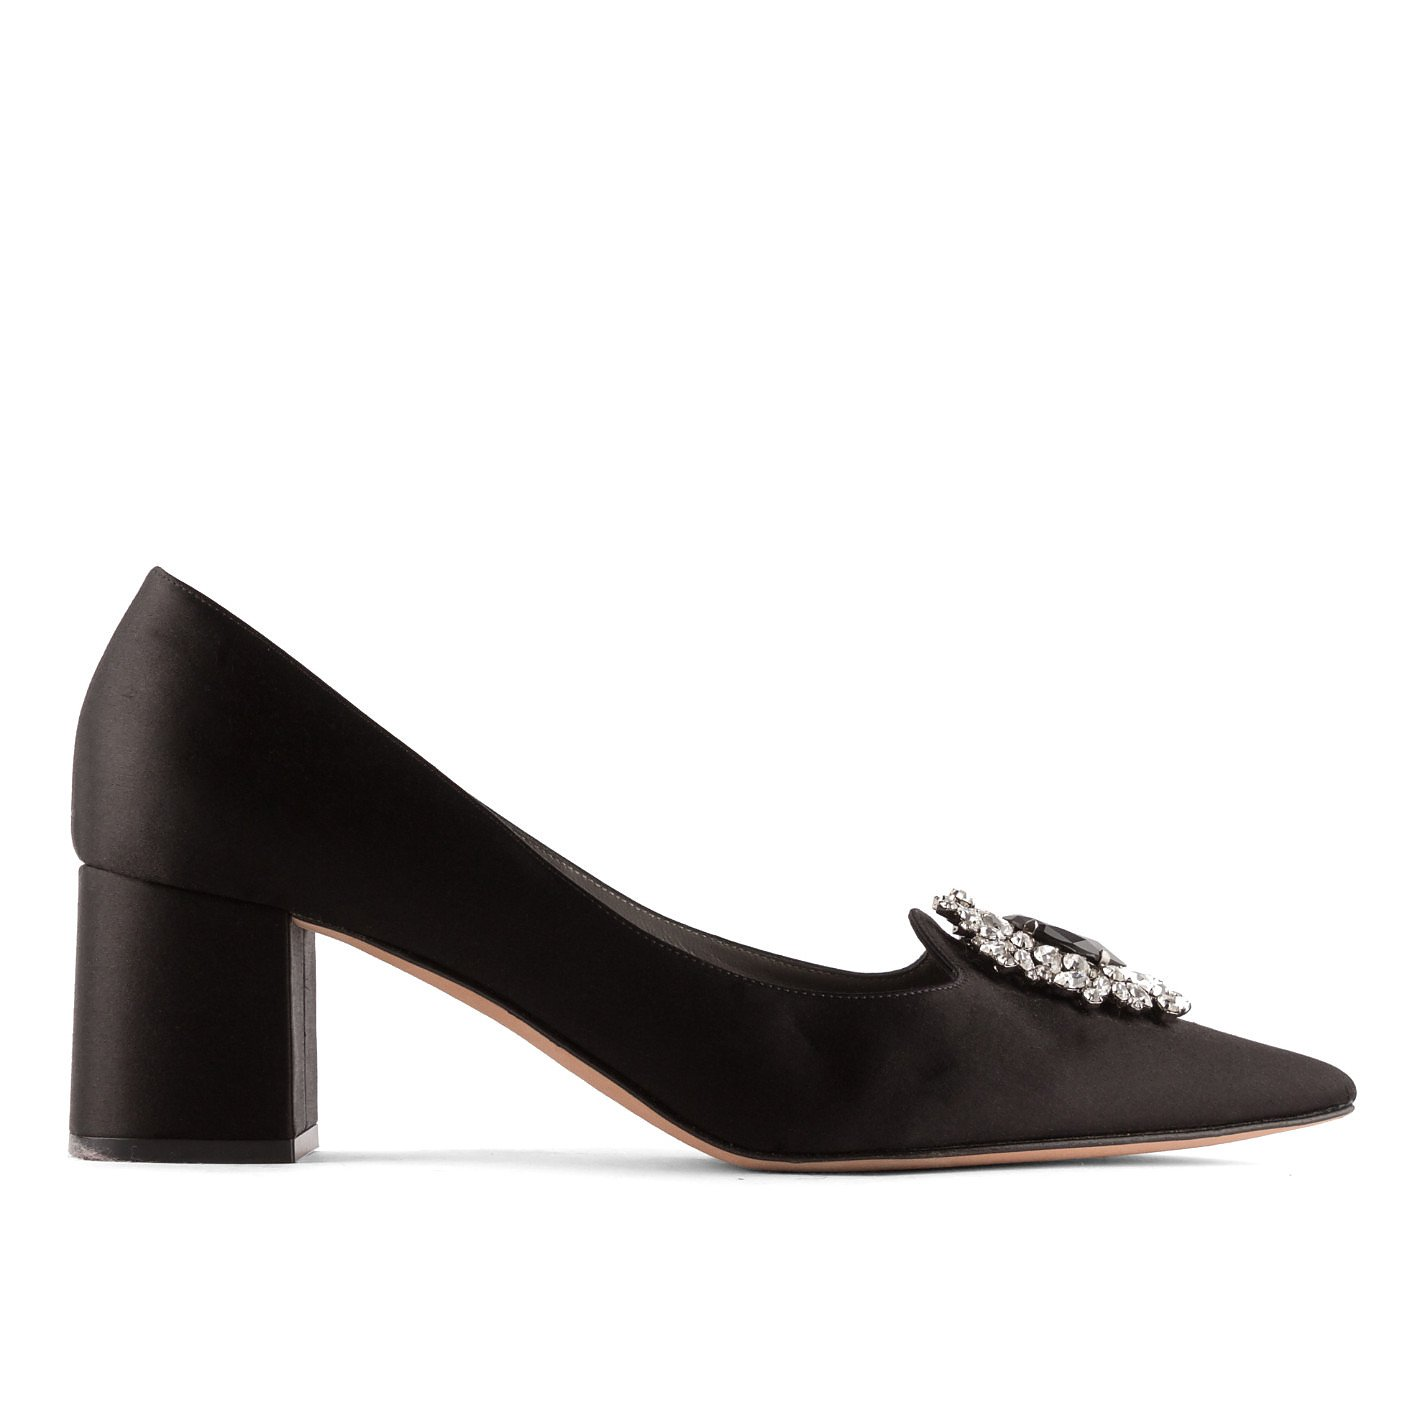 Gina Crystal-Embellished Satin Block Heels